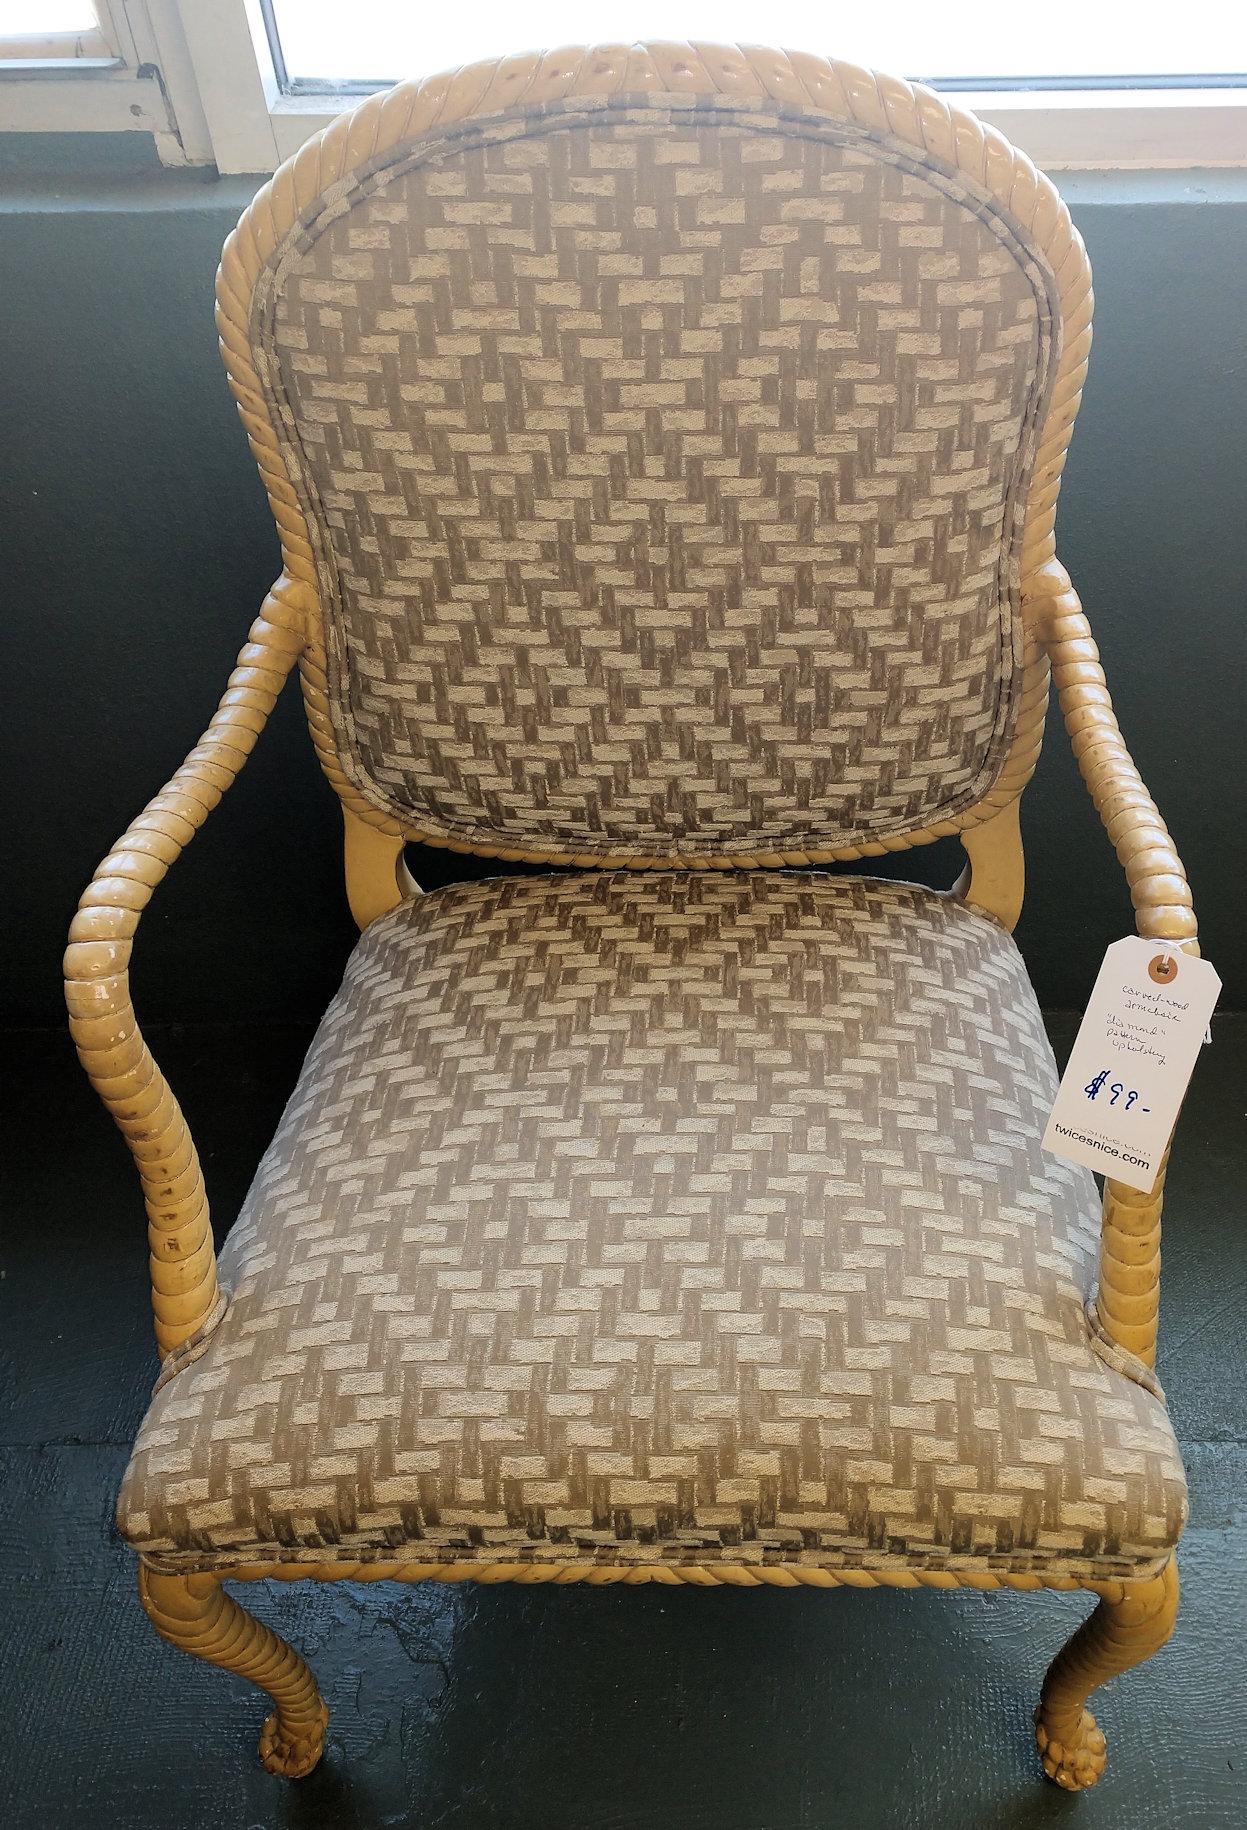 Lr0282-Chair-wood-diamondpattern